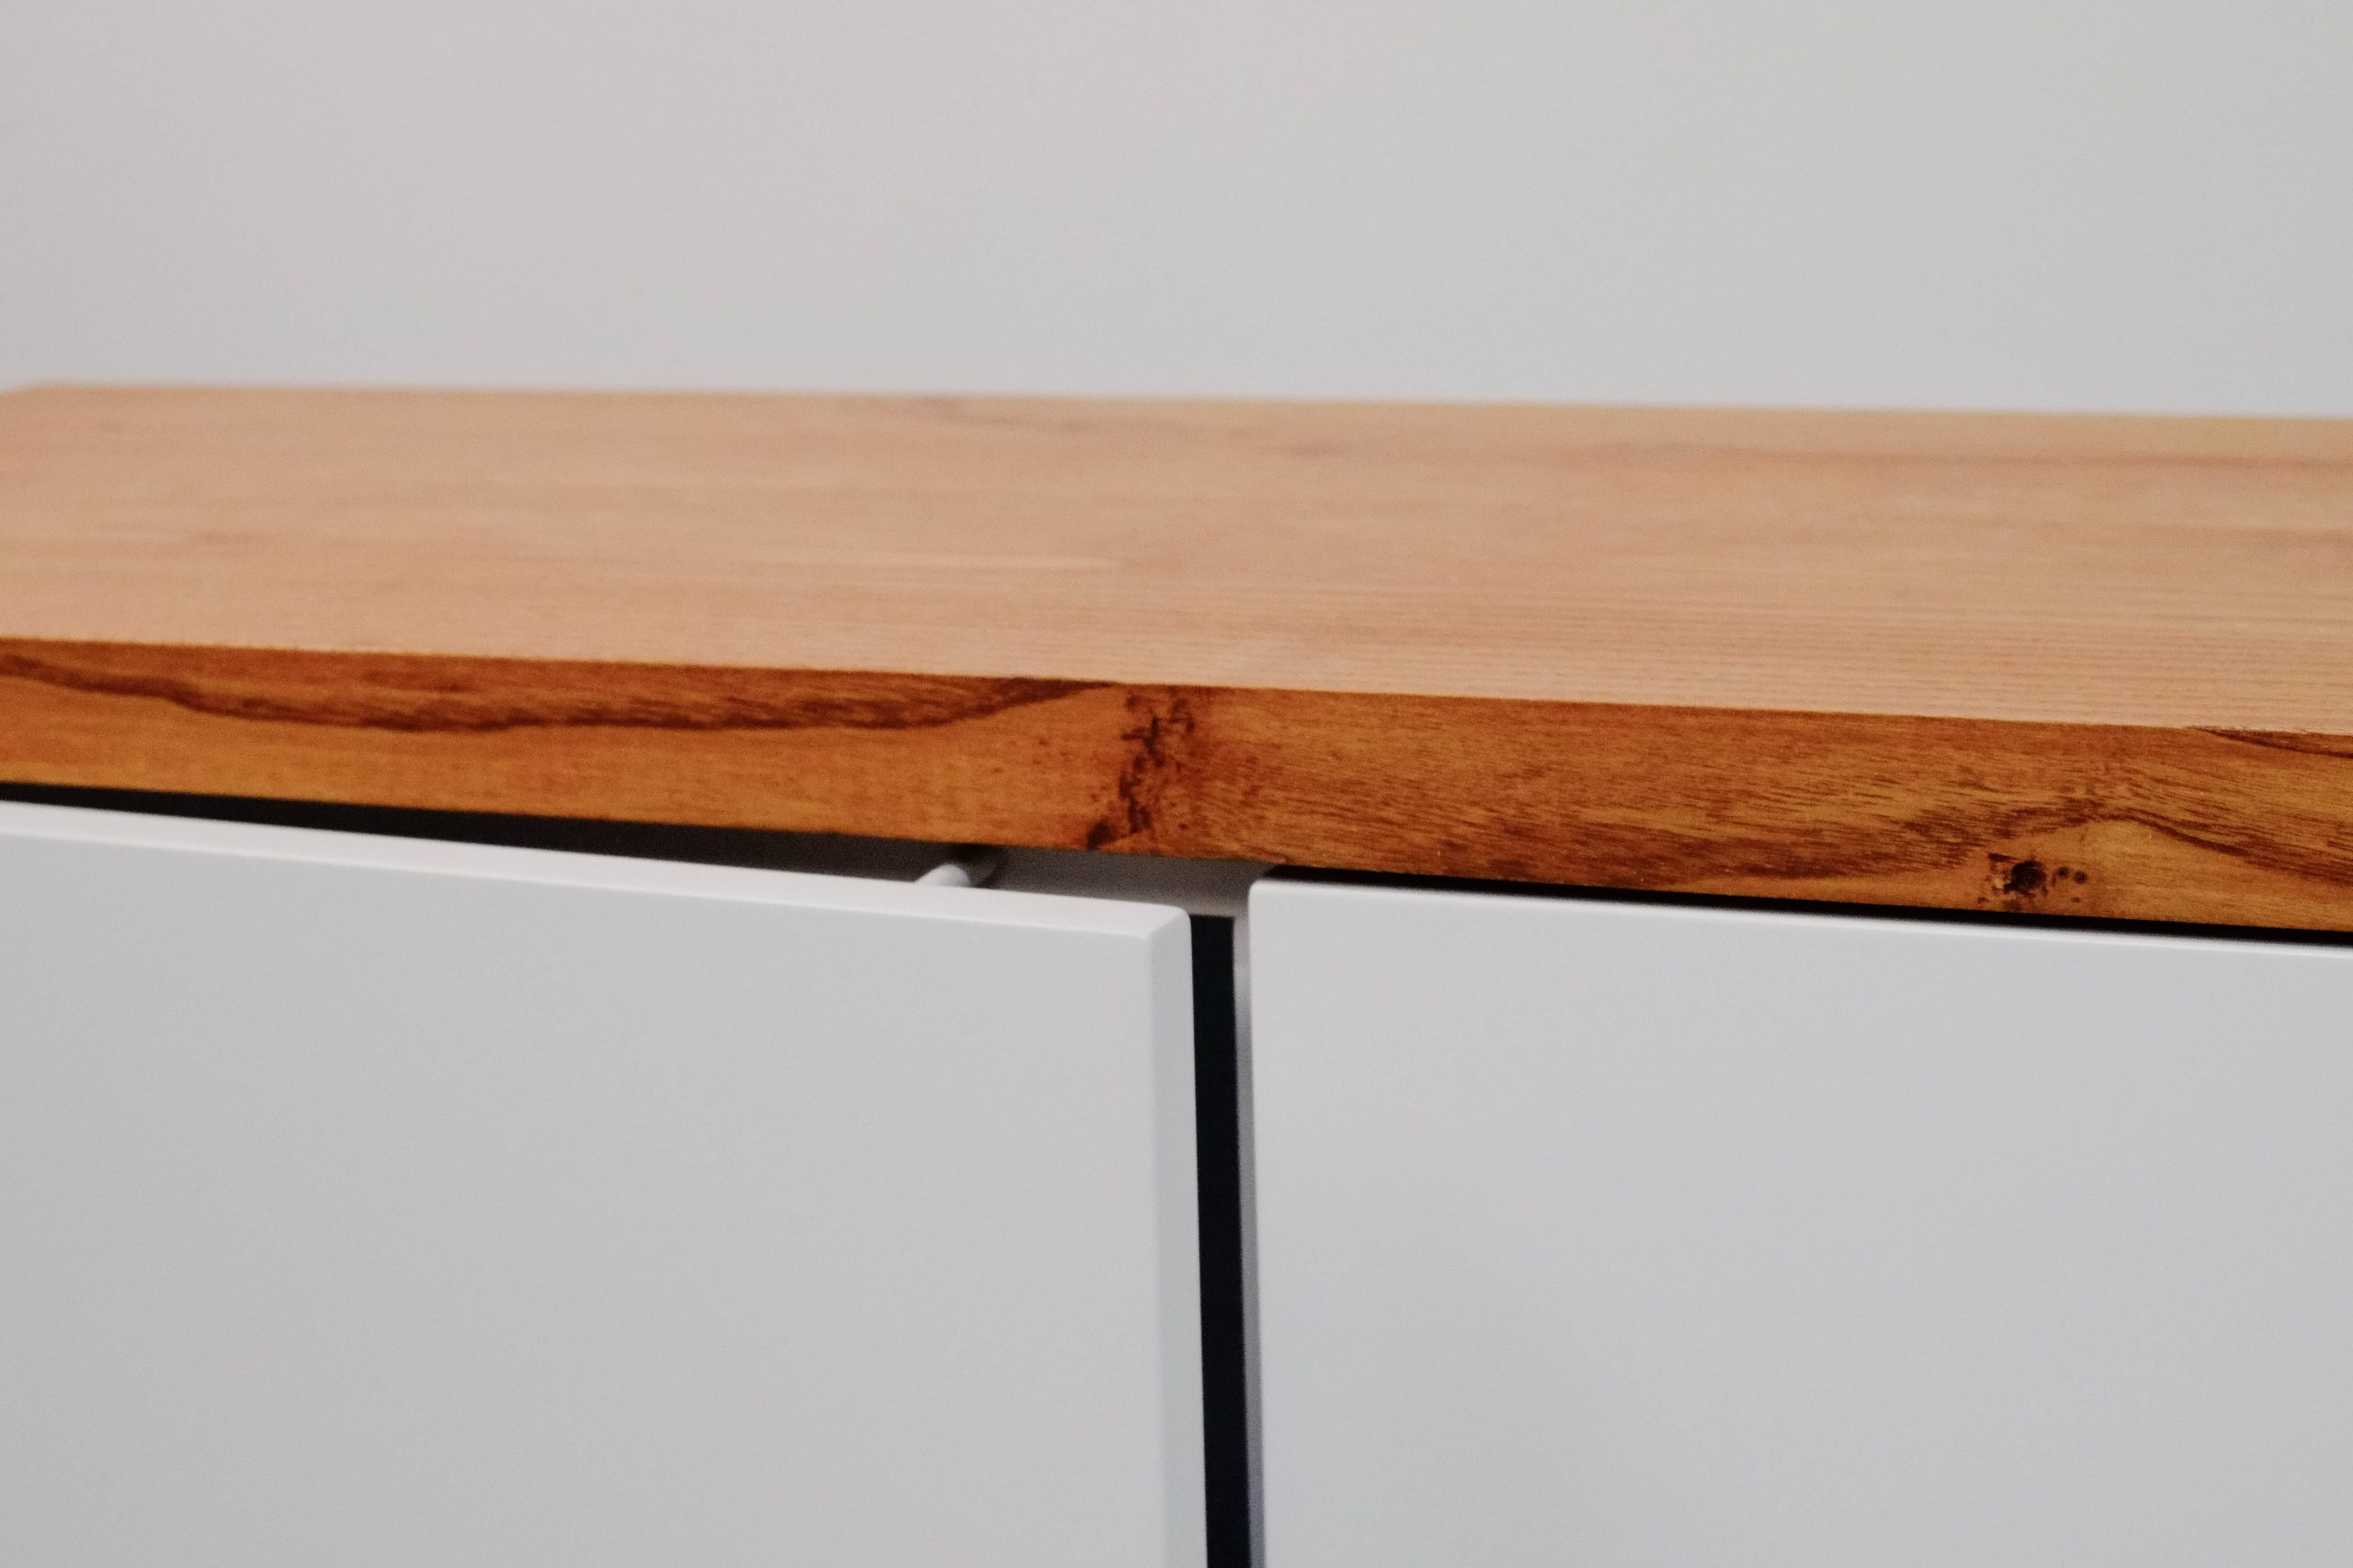 detalle cajon push fabricado a mano blanco lacado mueble de salon